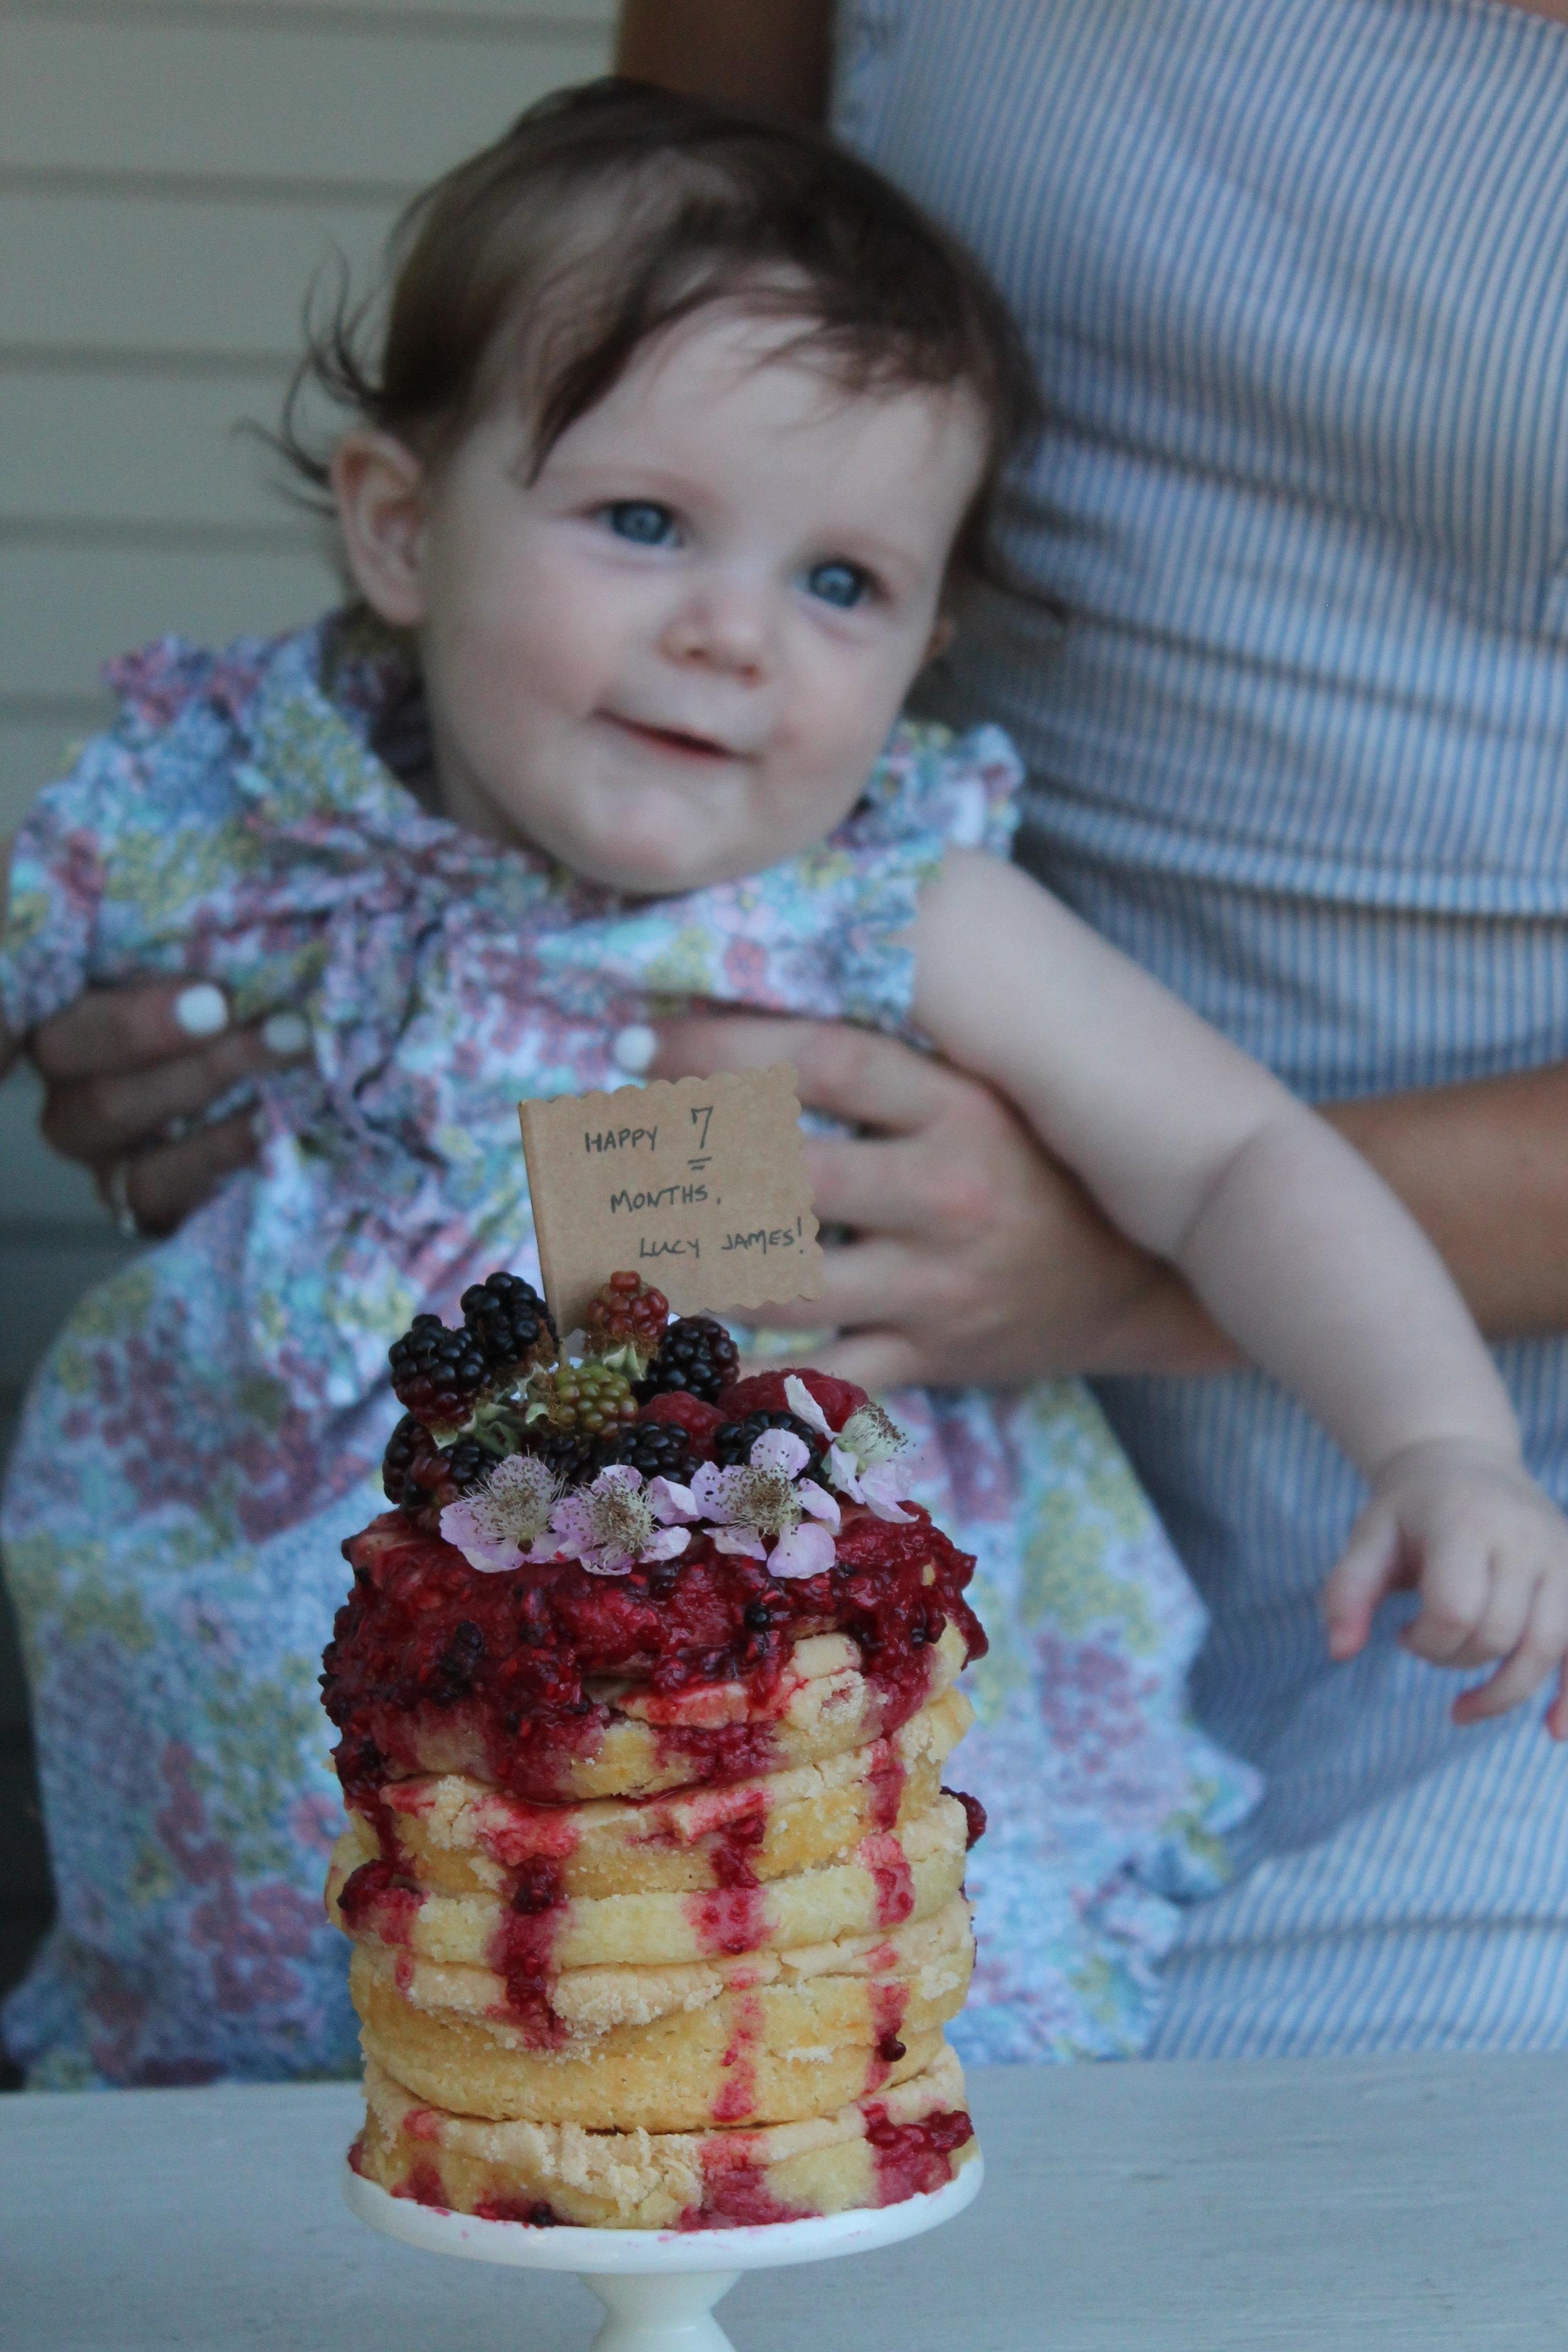 Month 7:  Miss Gertrude's Caramel Cake